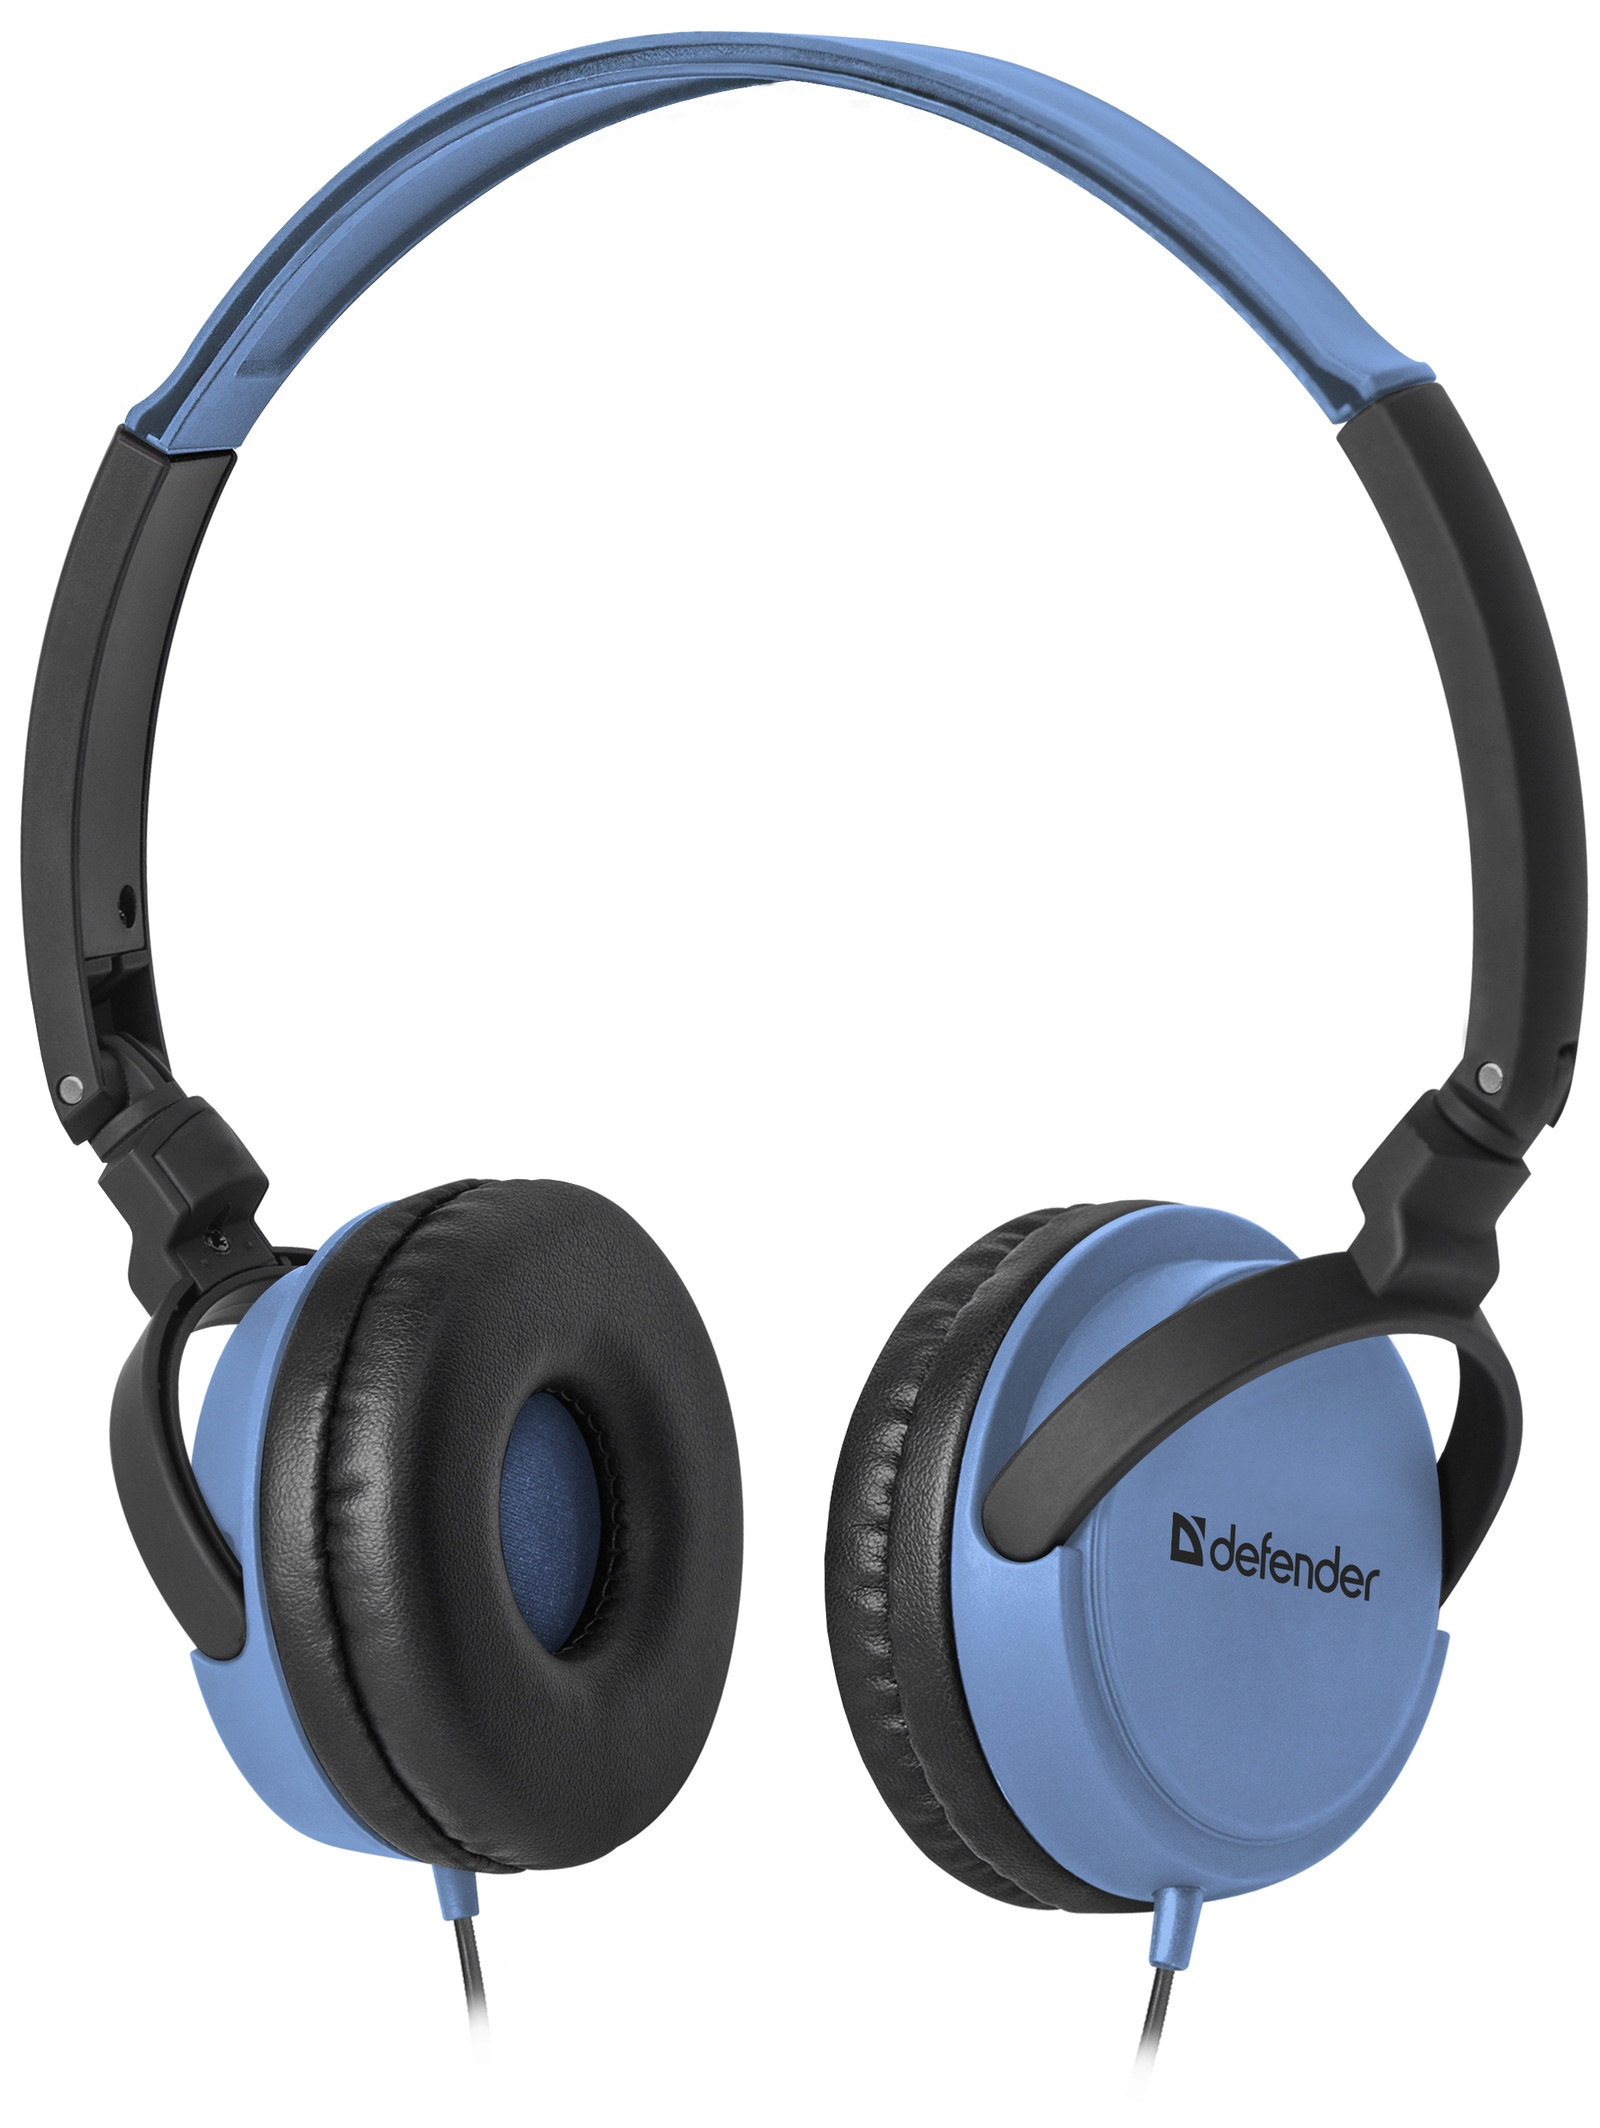 Фото - Наушники Defender Accord 160, 63161, синий азу для планшетов и ноутбуков